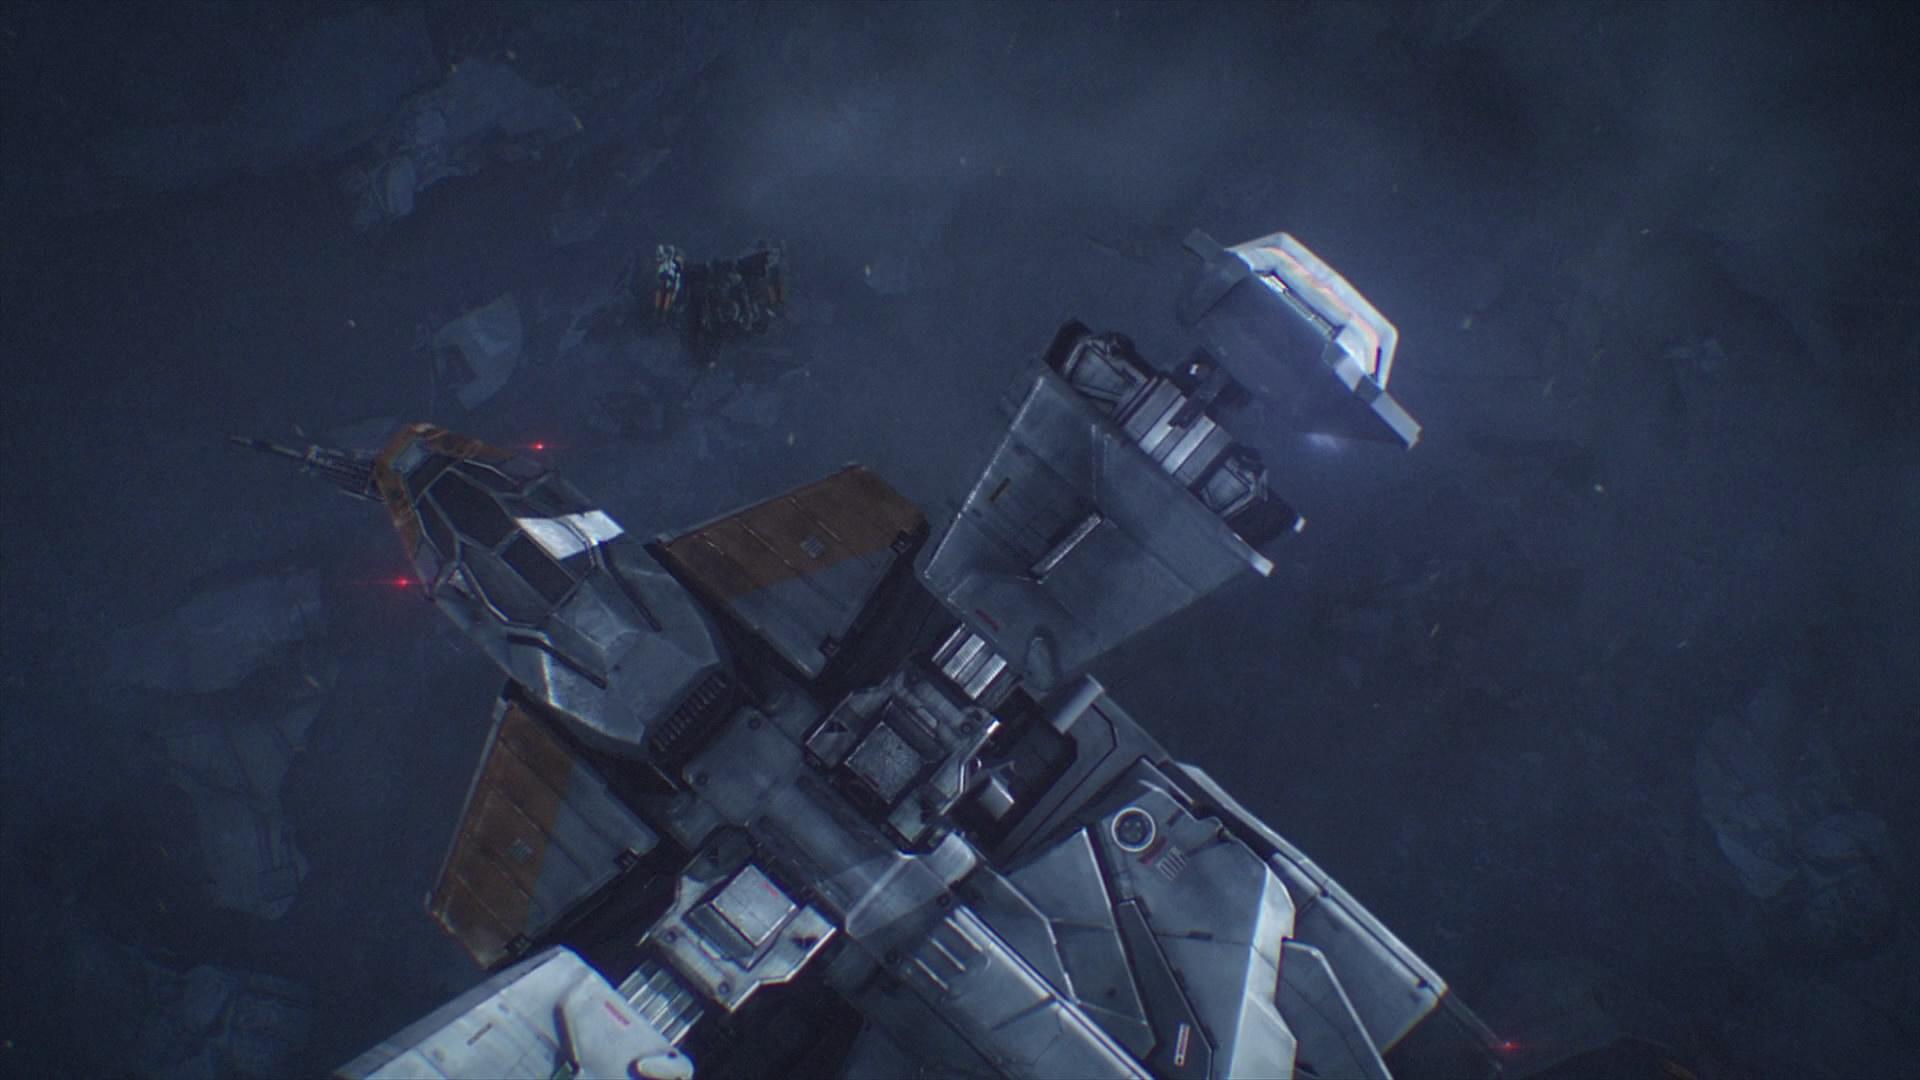 Sti-landingship-film-approaching-jaw-mmk2.jpg